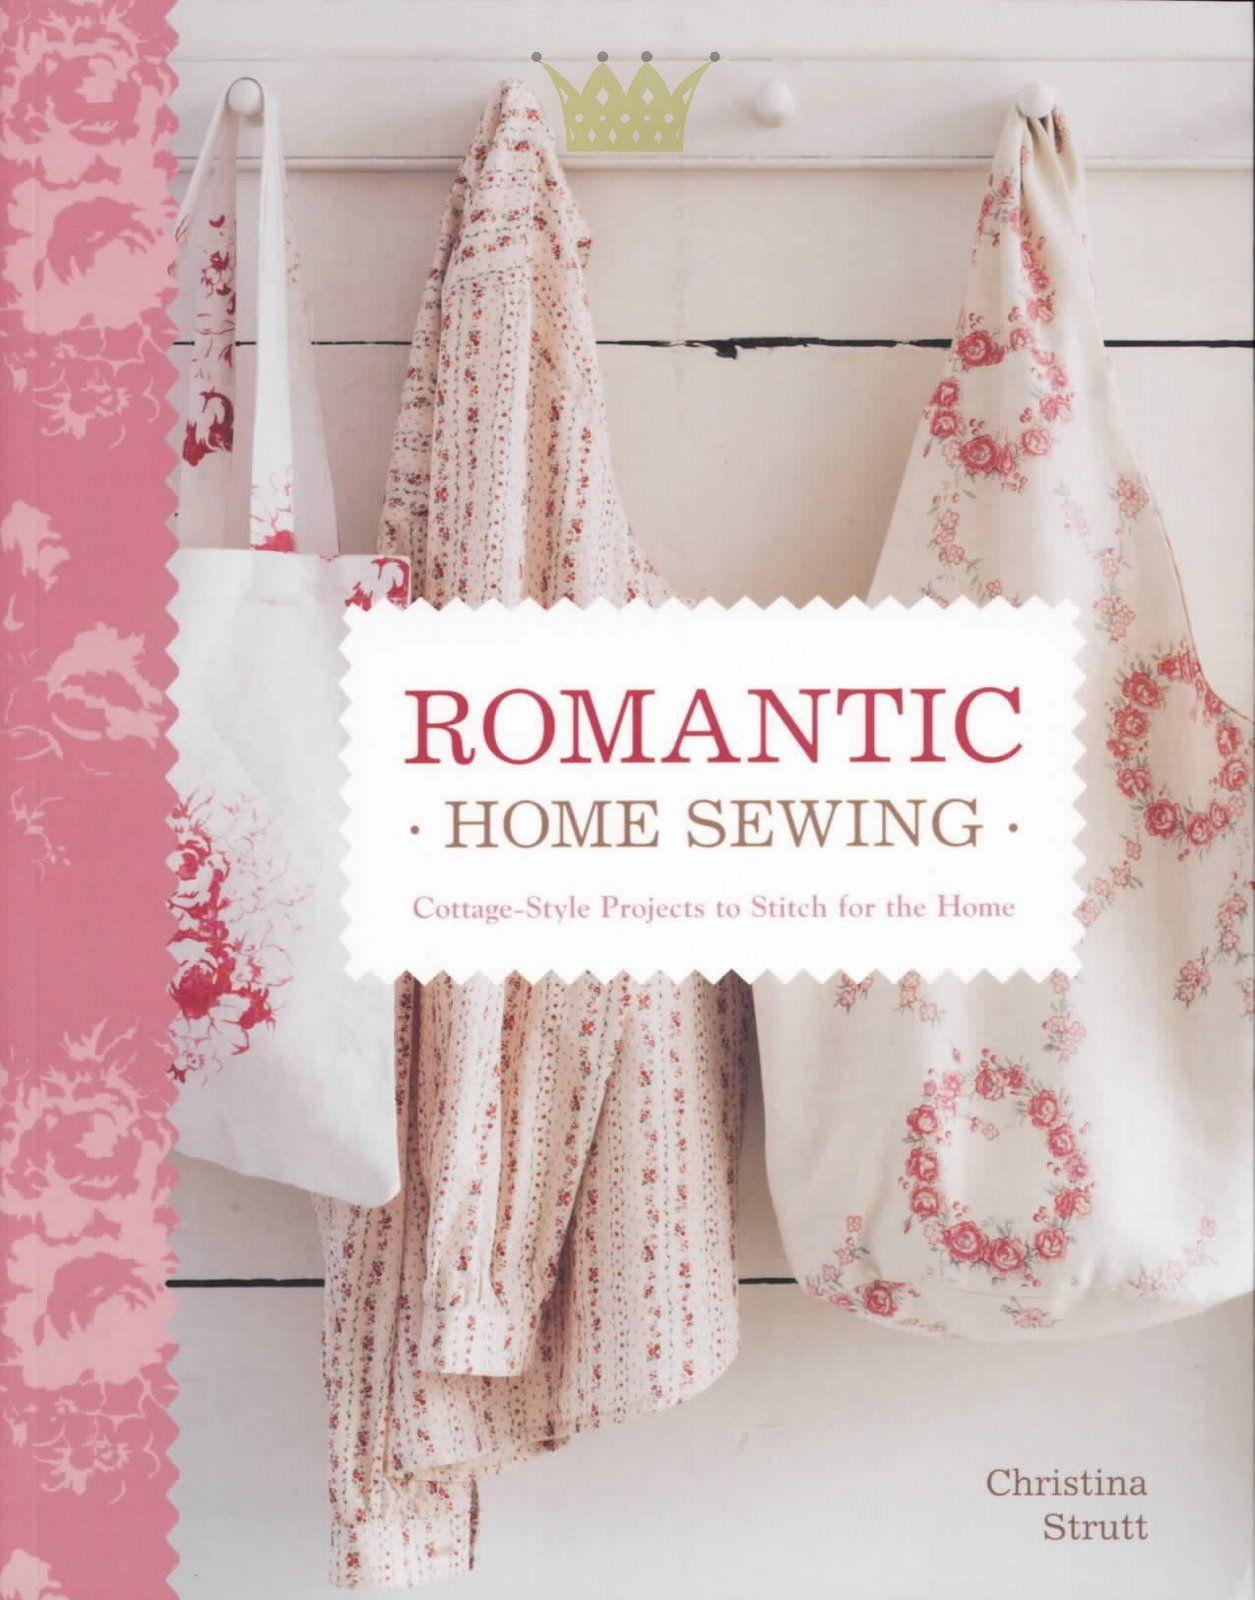 Revistas de manualidades gratis romantic home sewing revista inglesa de costura para el hogar - Manualidades para hogar ...